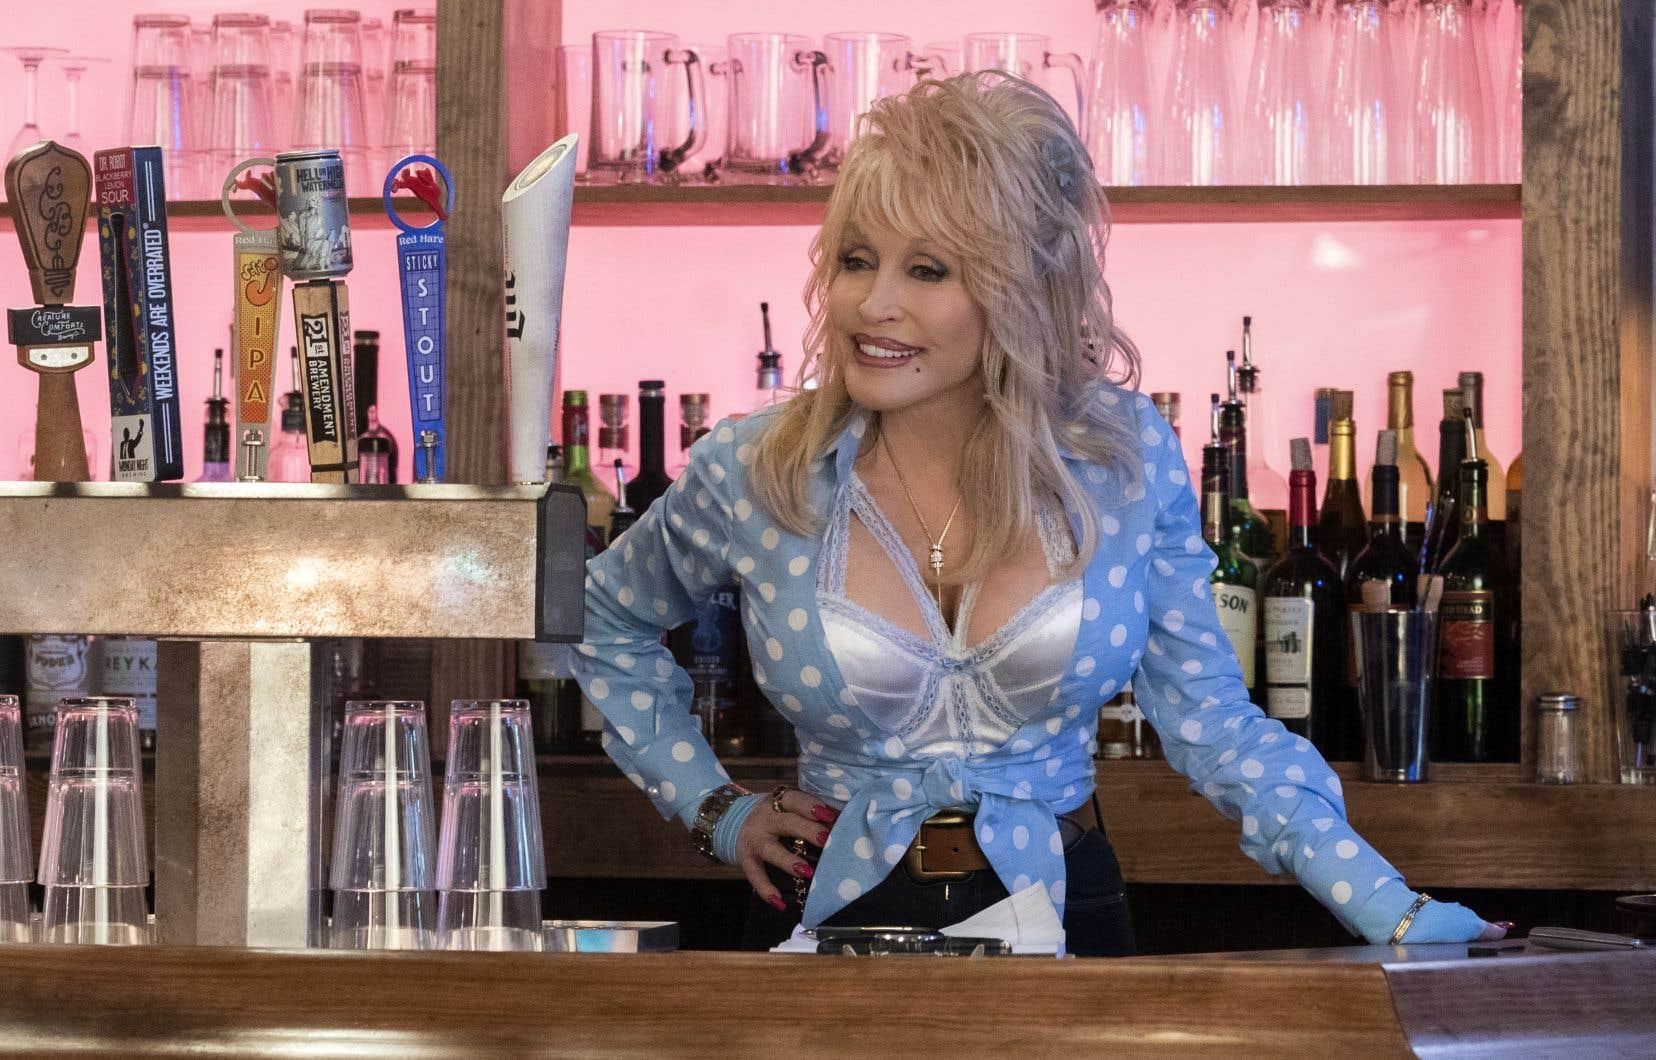 La chanteuse Dolly Parton